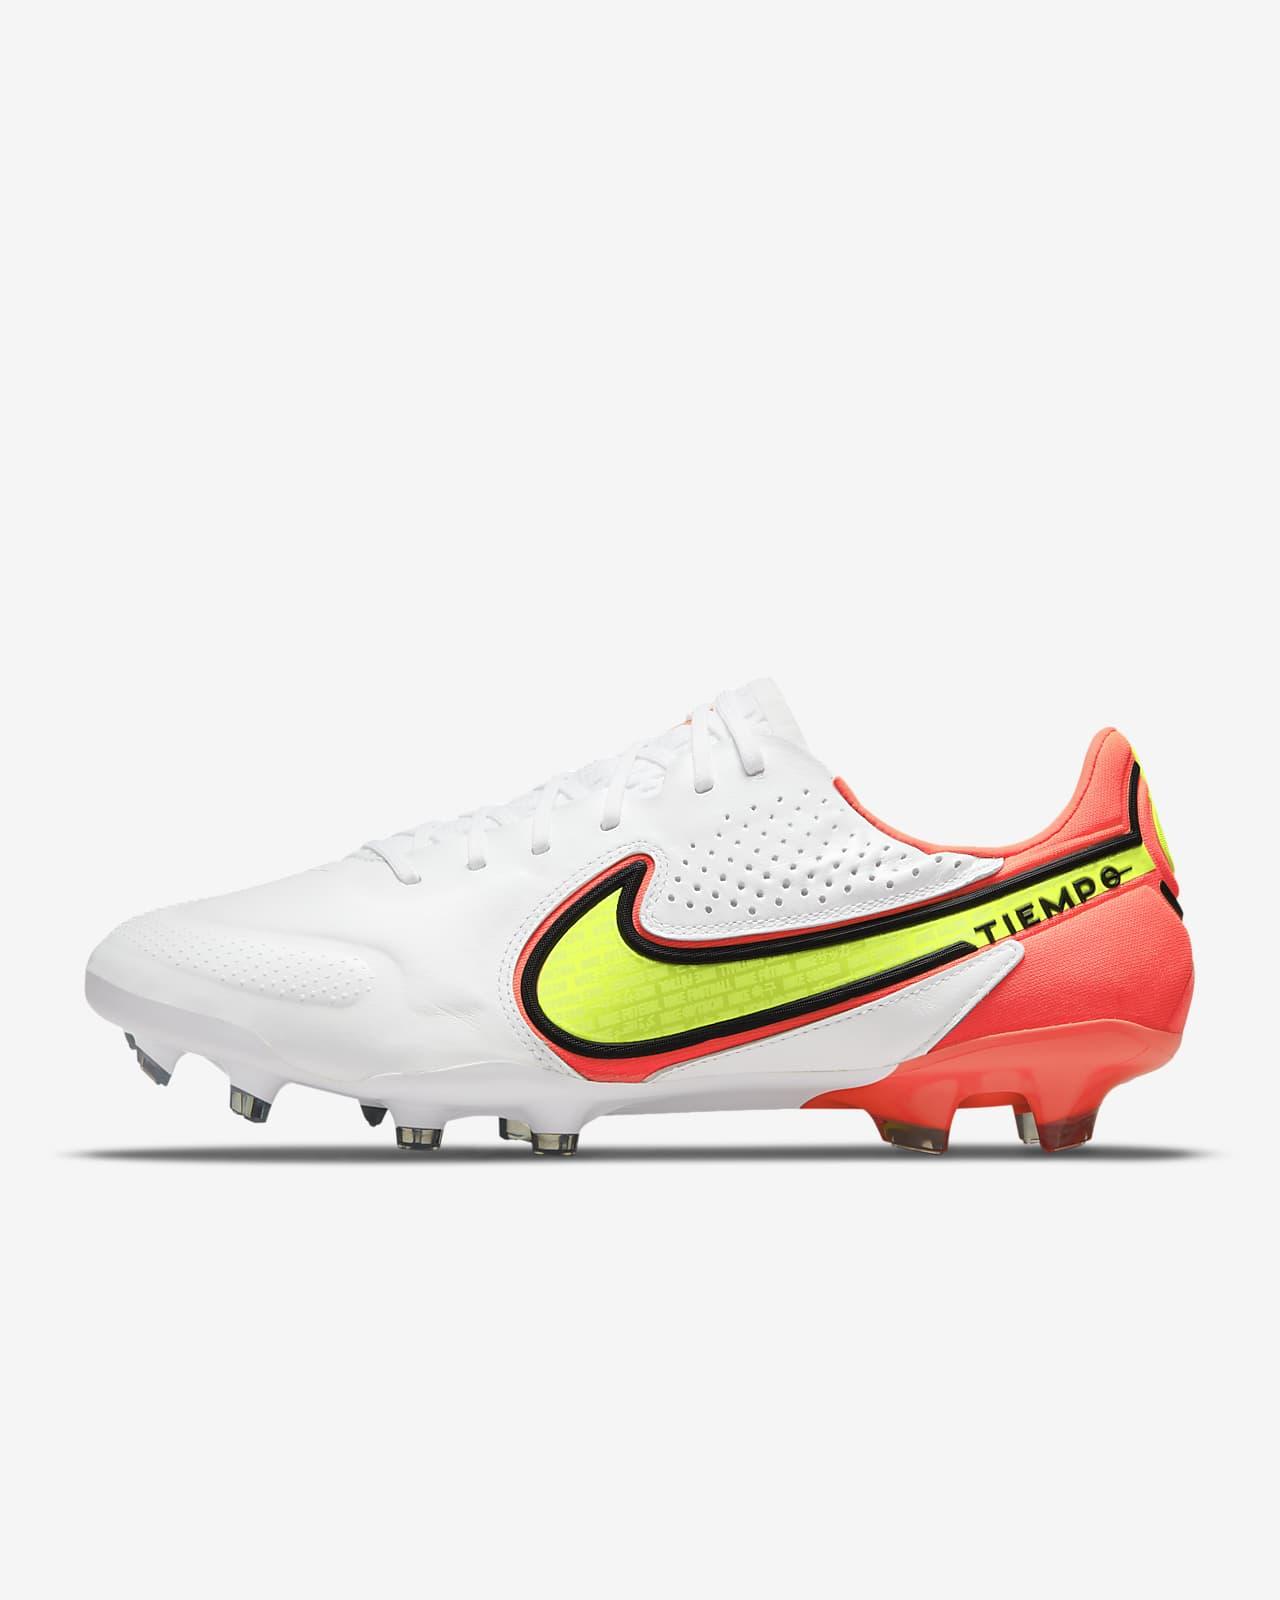 Nike Tiempo Legend 9 Elite FG Firm-Ground Soccer Cleat